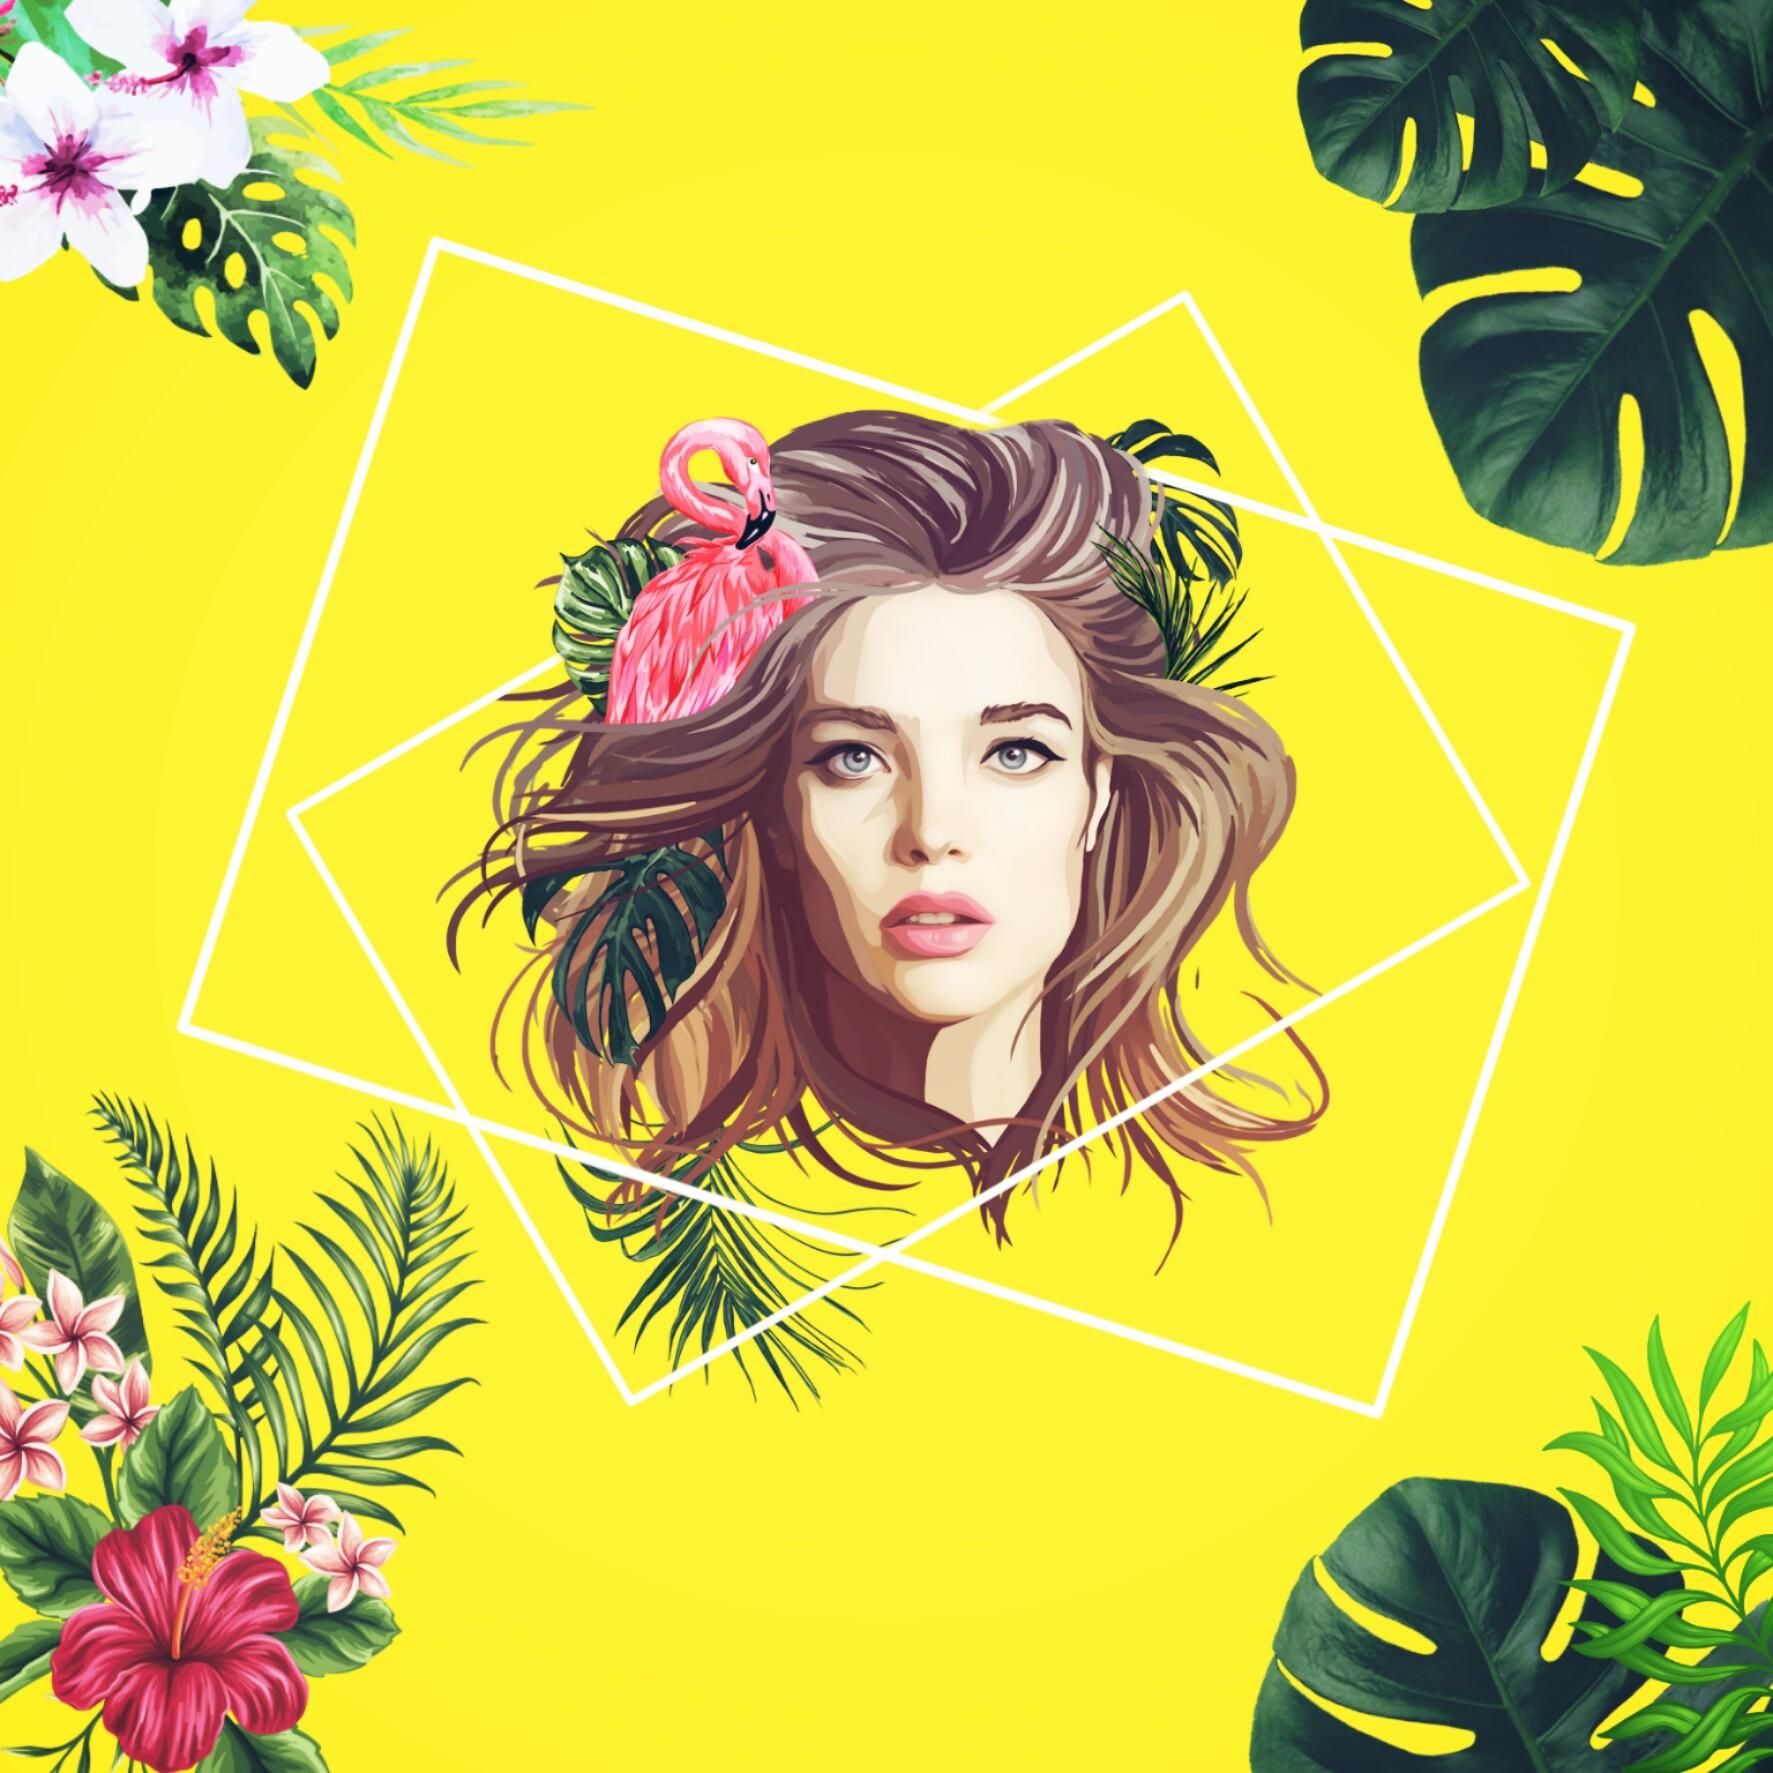 #flamingo #tropical #plants #flower #girl #NataSupernova